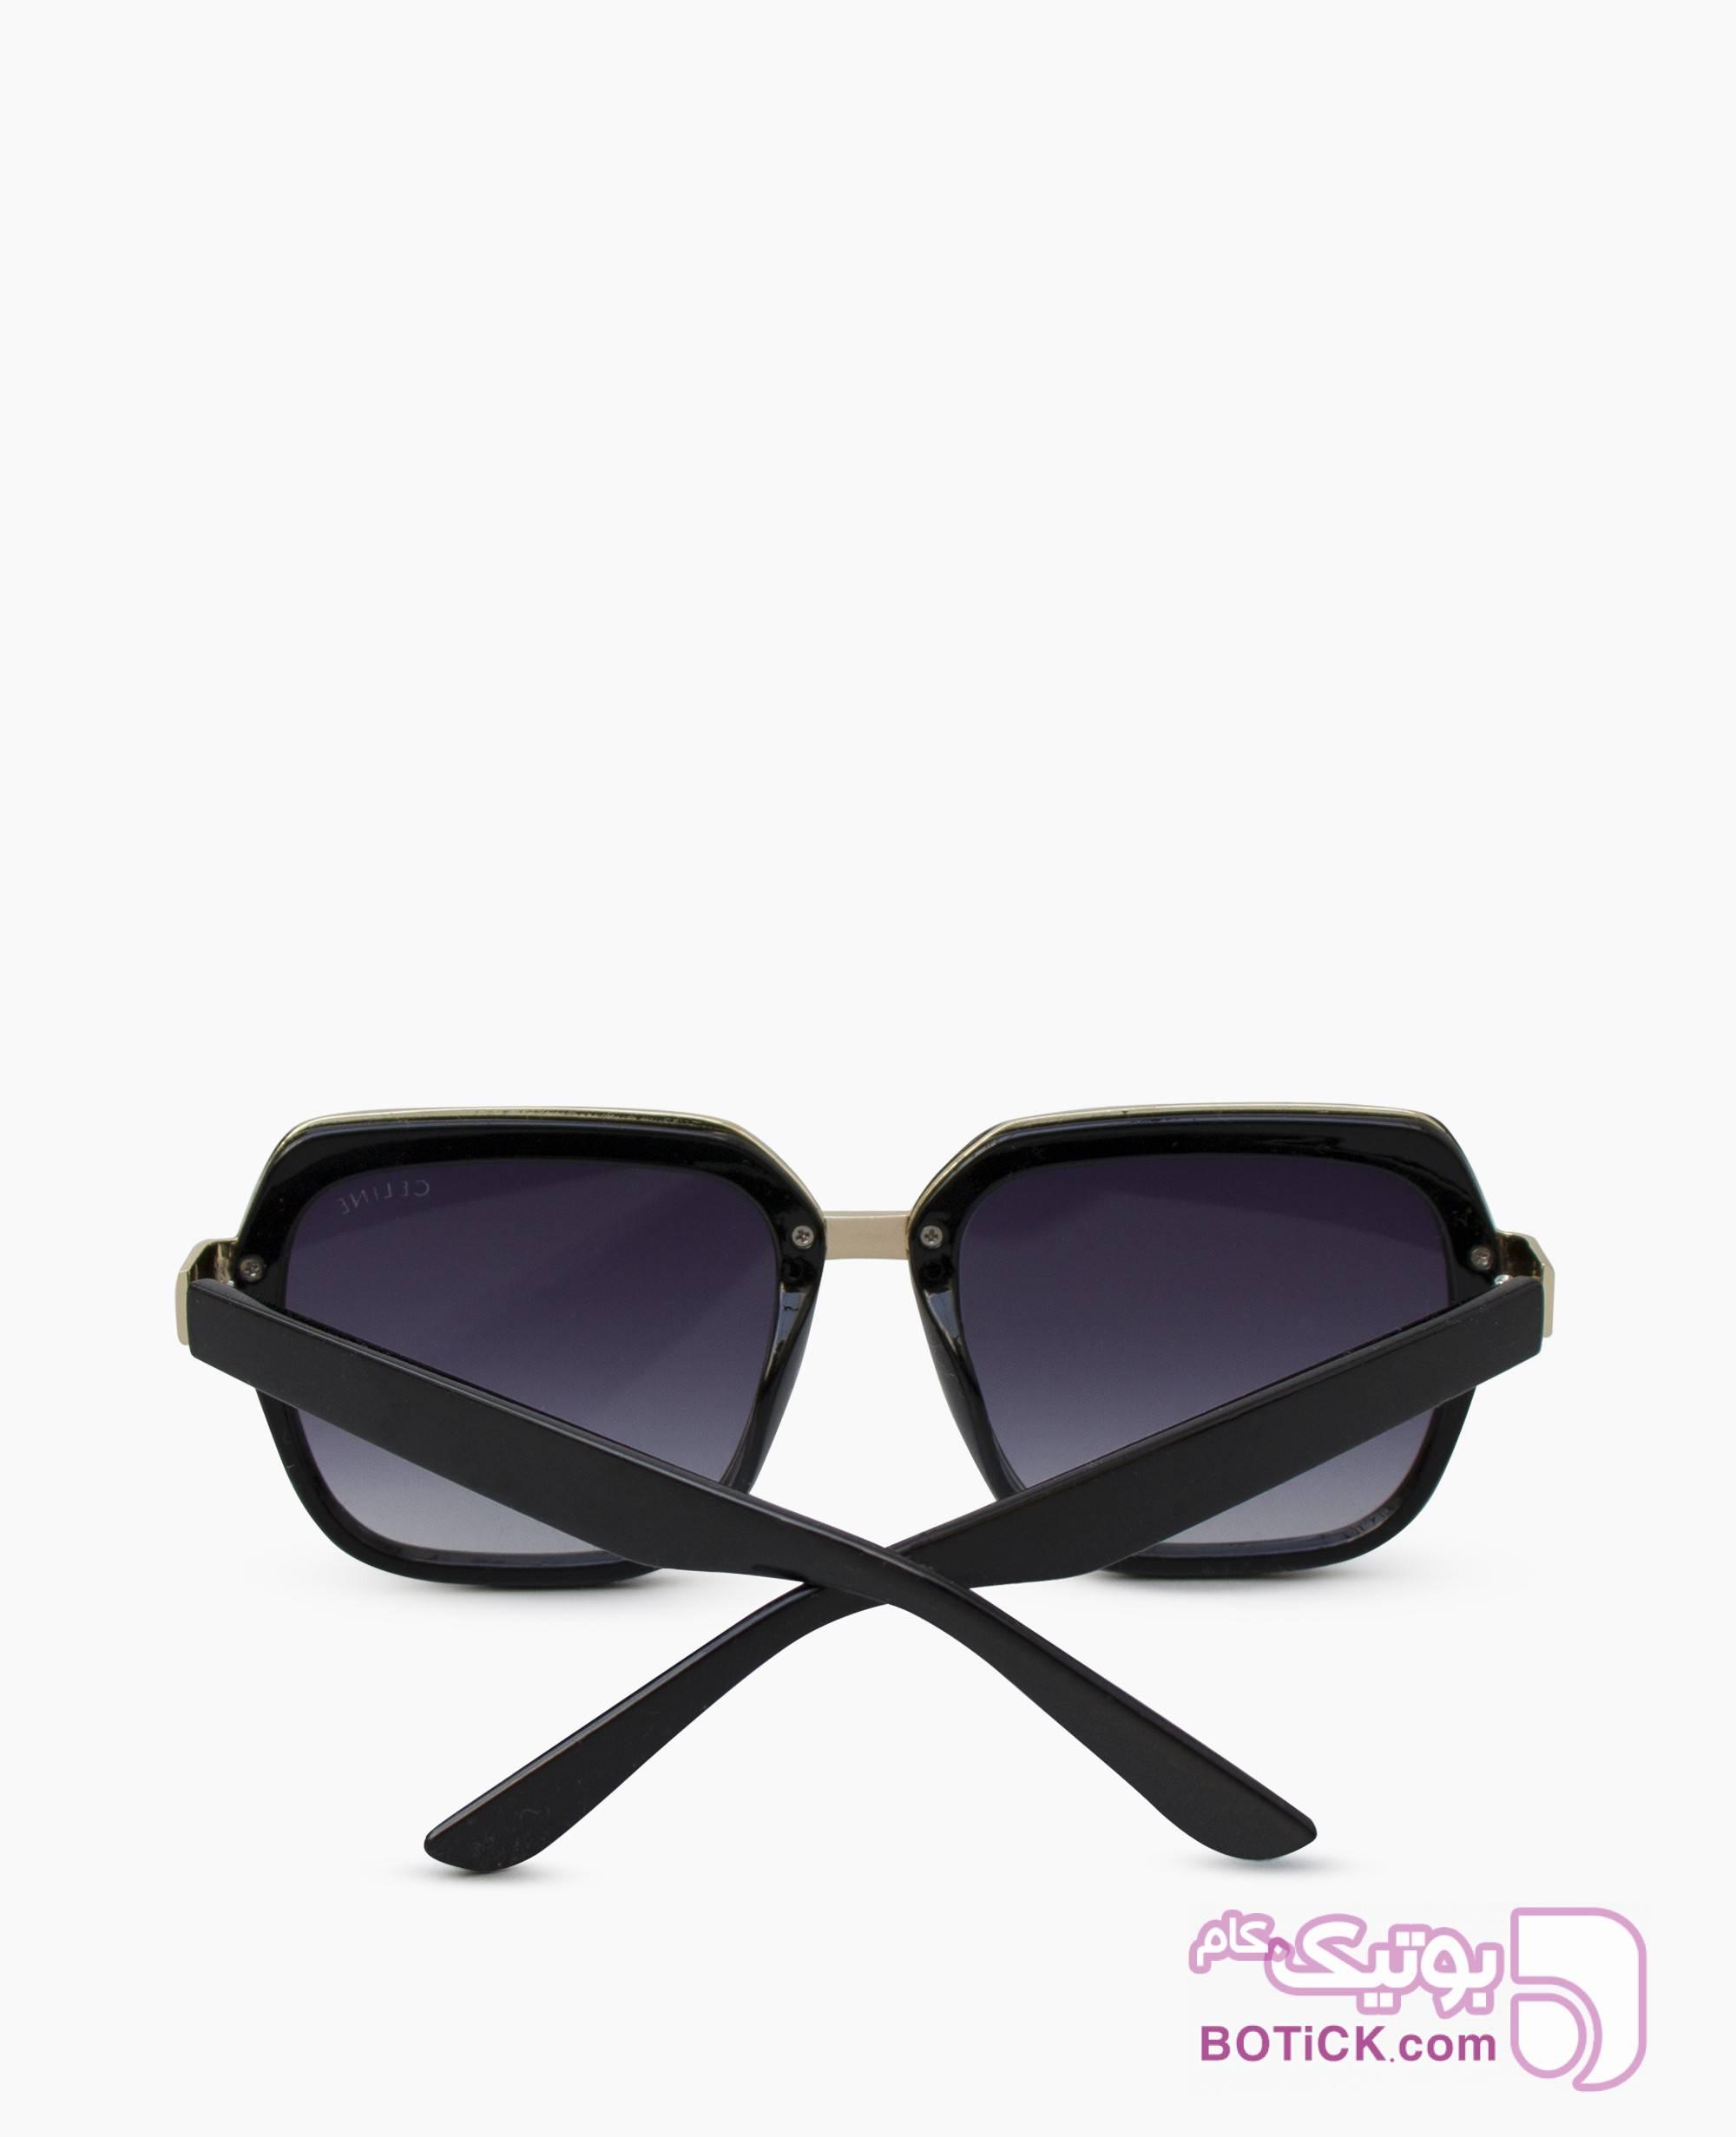 عینک آفتابی CELINE کد 8435 مشکی عینک آفتابی